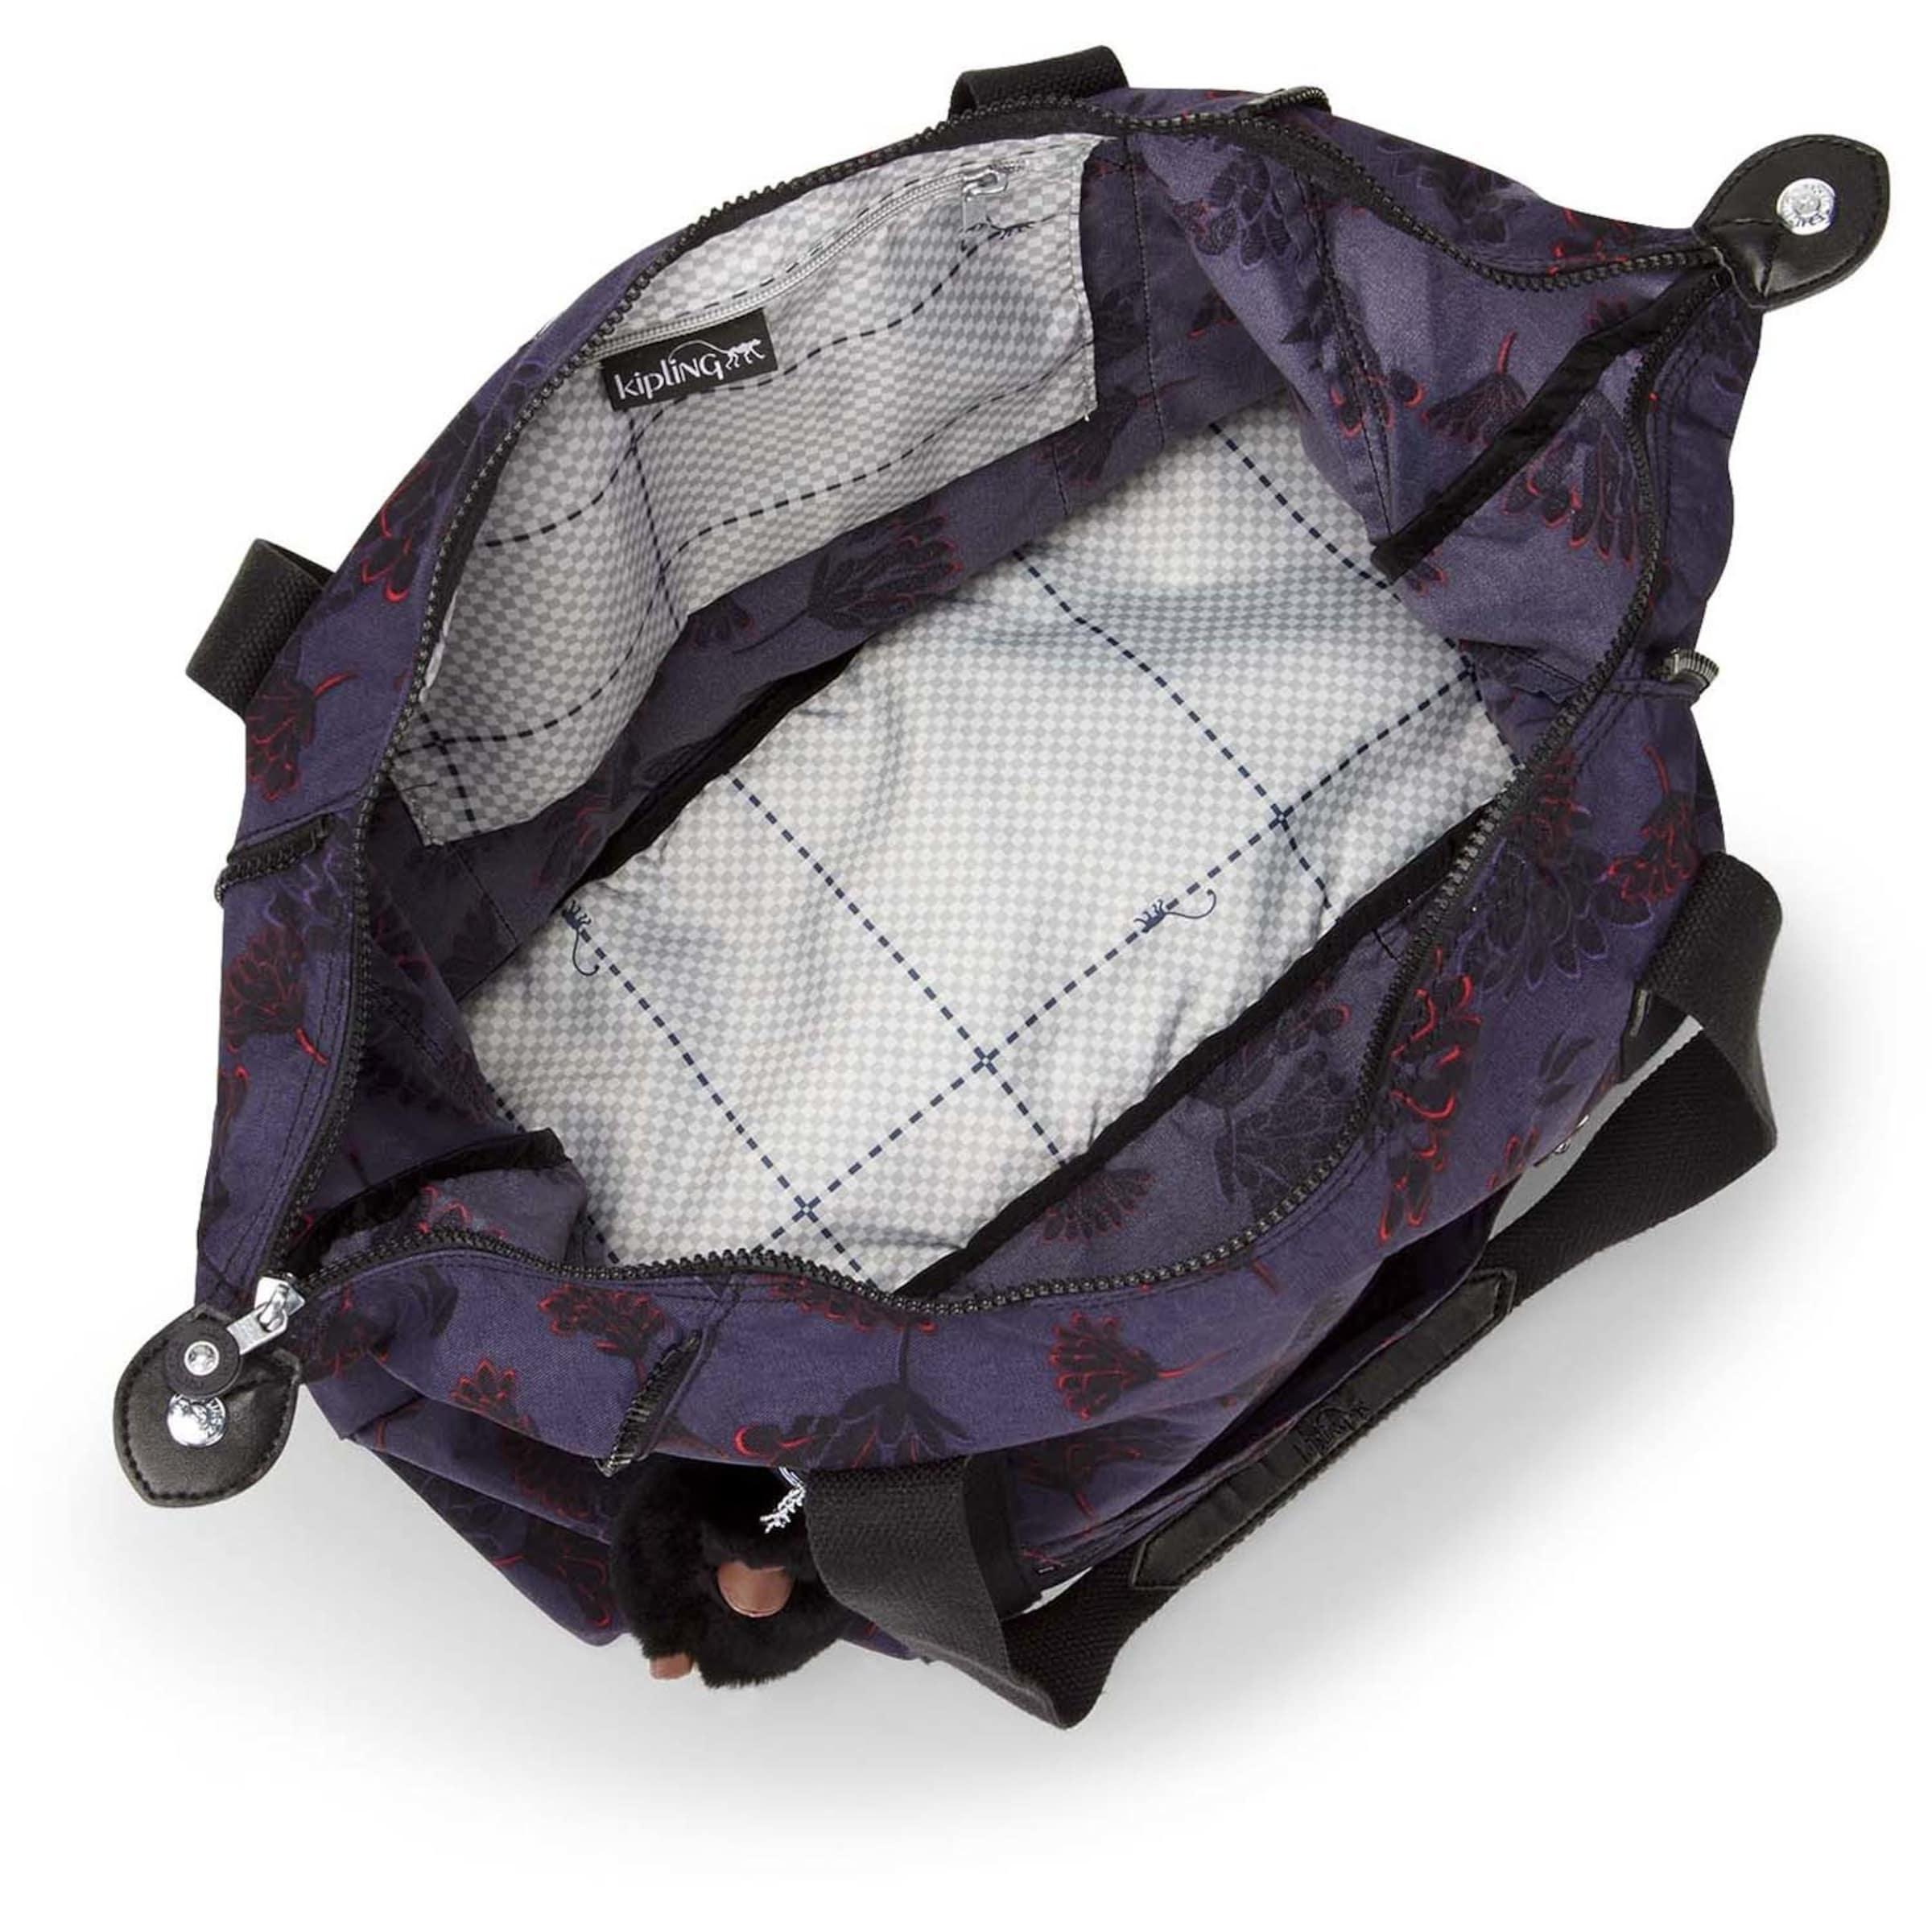 KIPLING Basic Plus Art M Weekender Reisetasche 58 cm Günstige Angebote R3y5tXXz